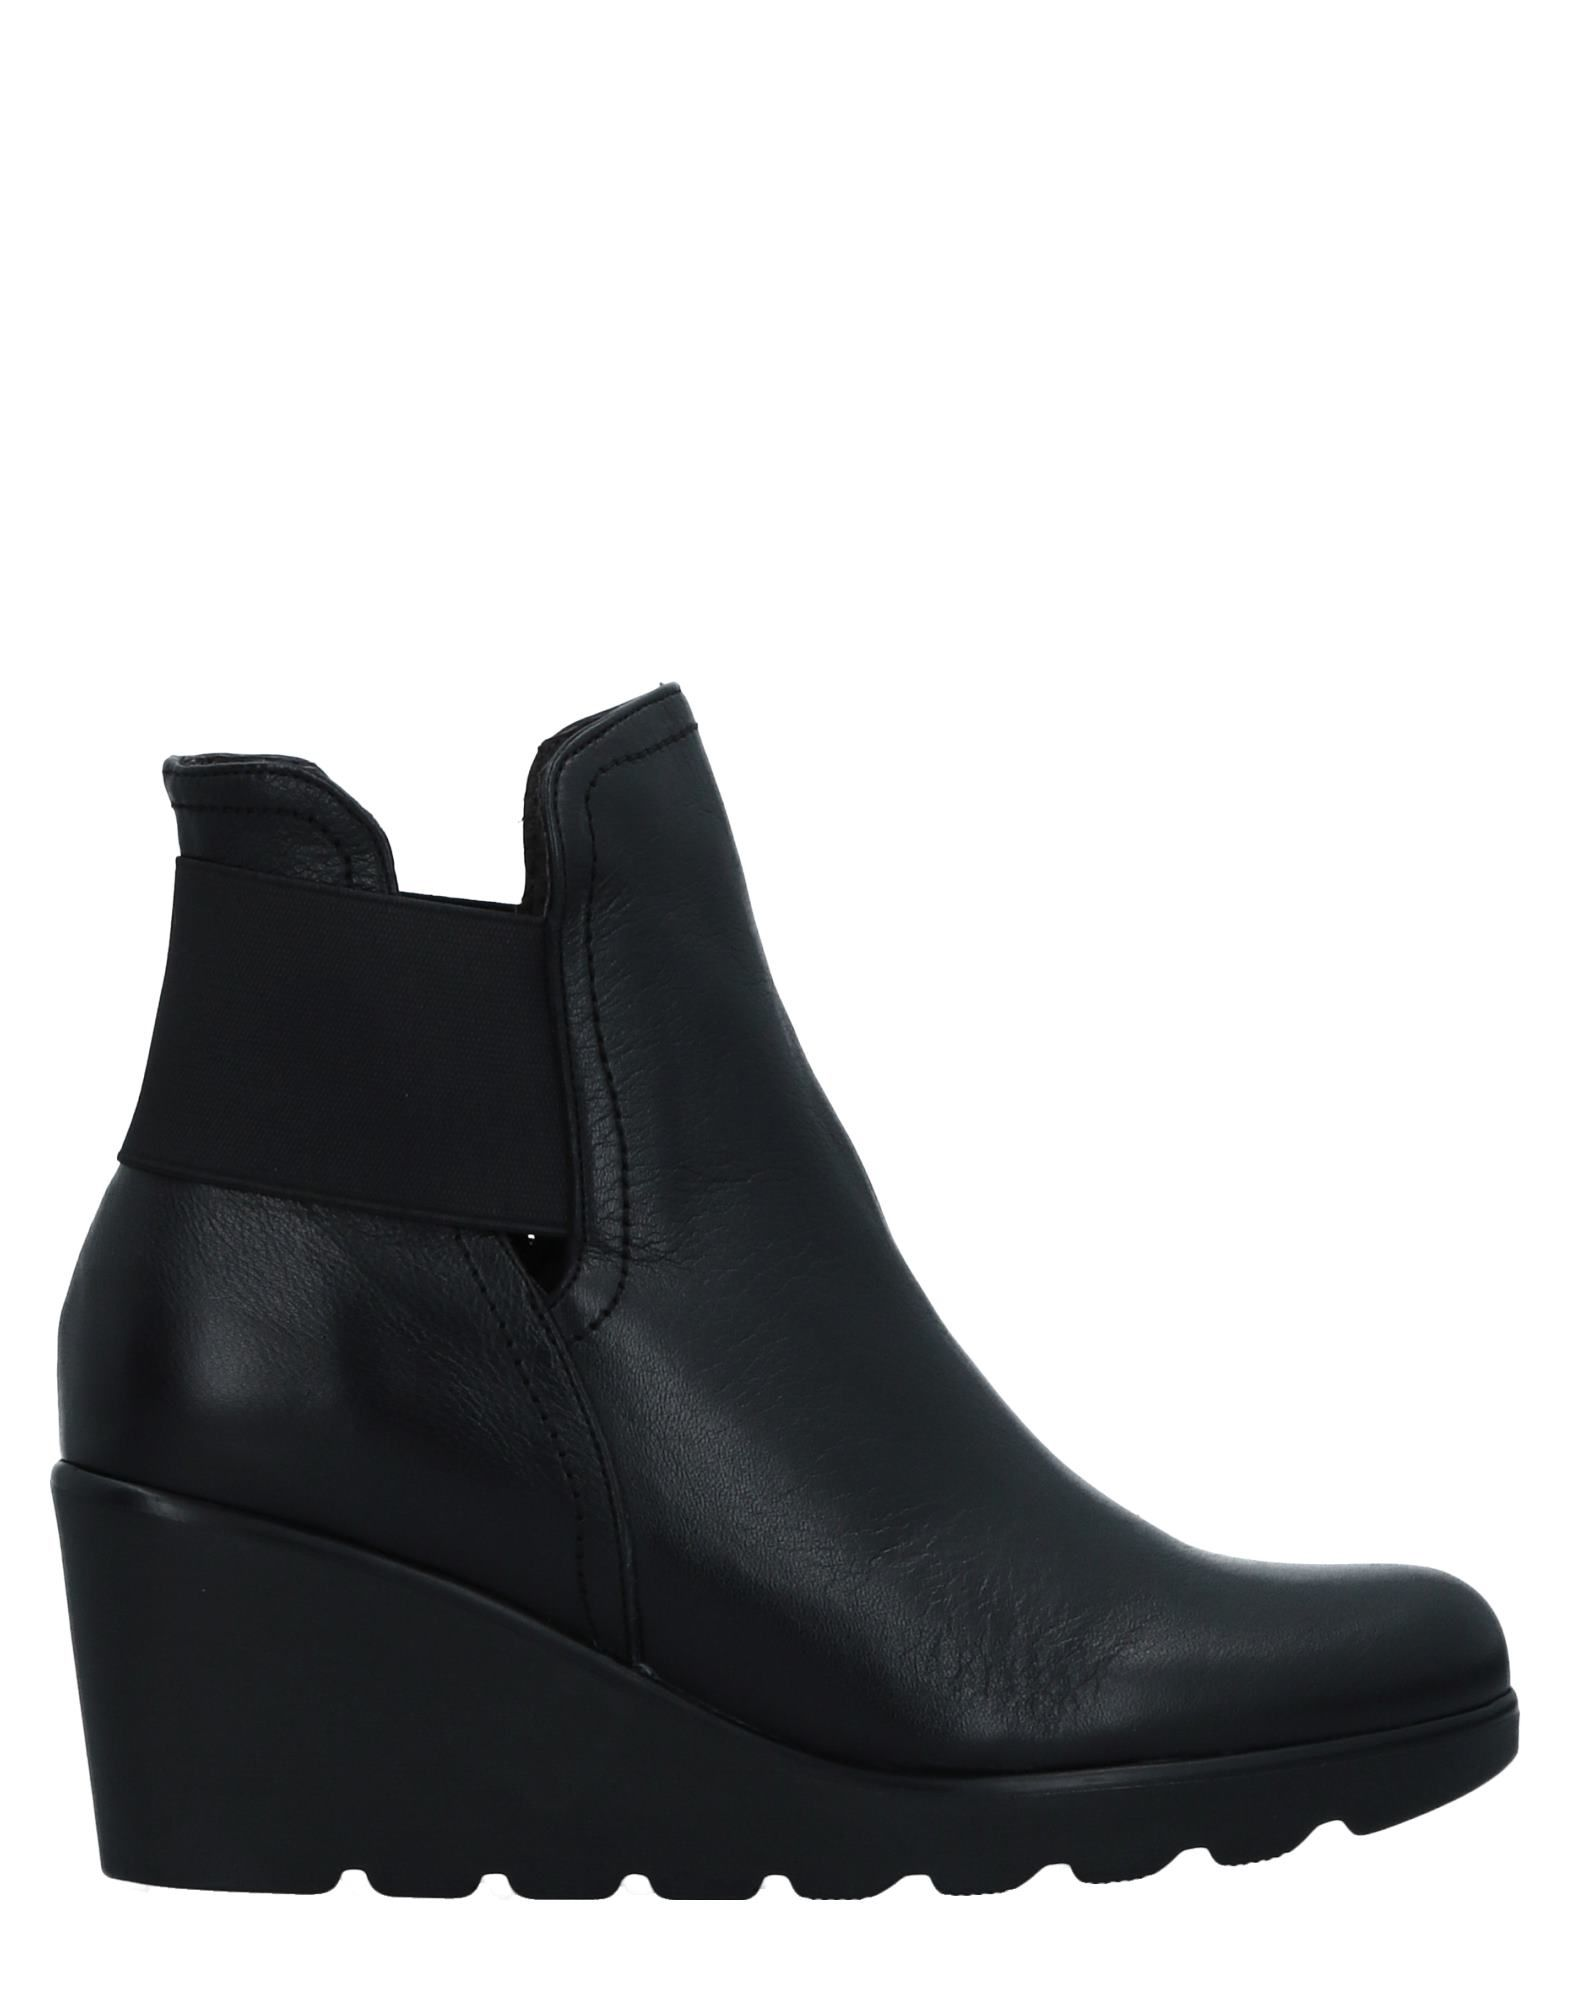 Toni Pons Stiefelette Damen  11517238XU Gute Qualität beliebte Schuhe